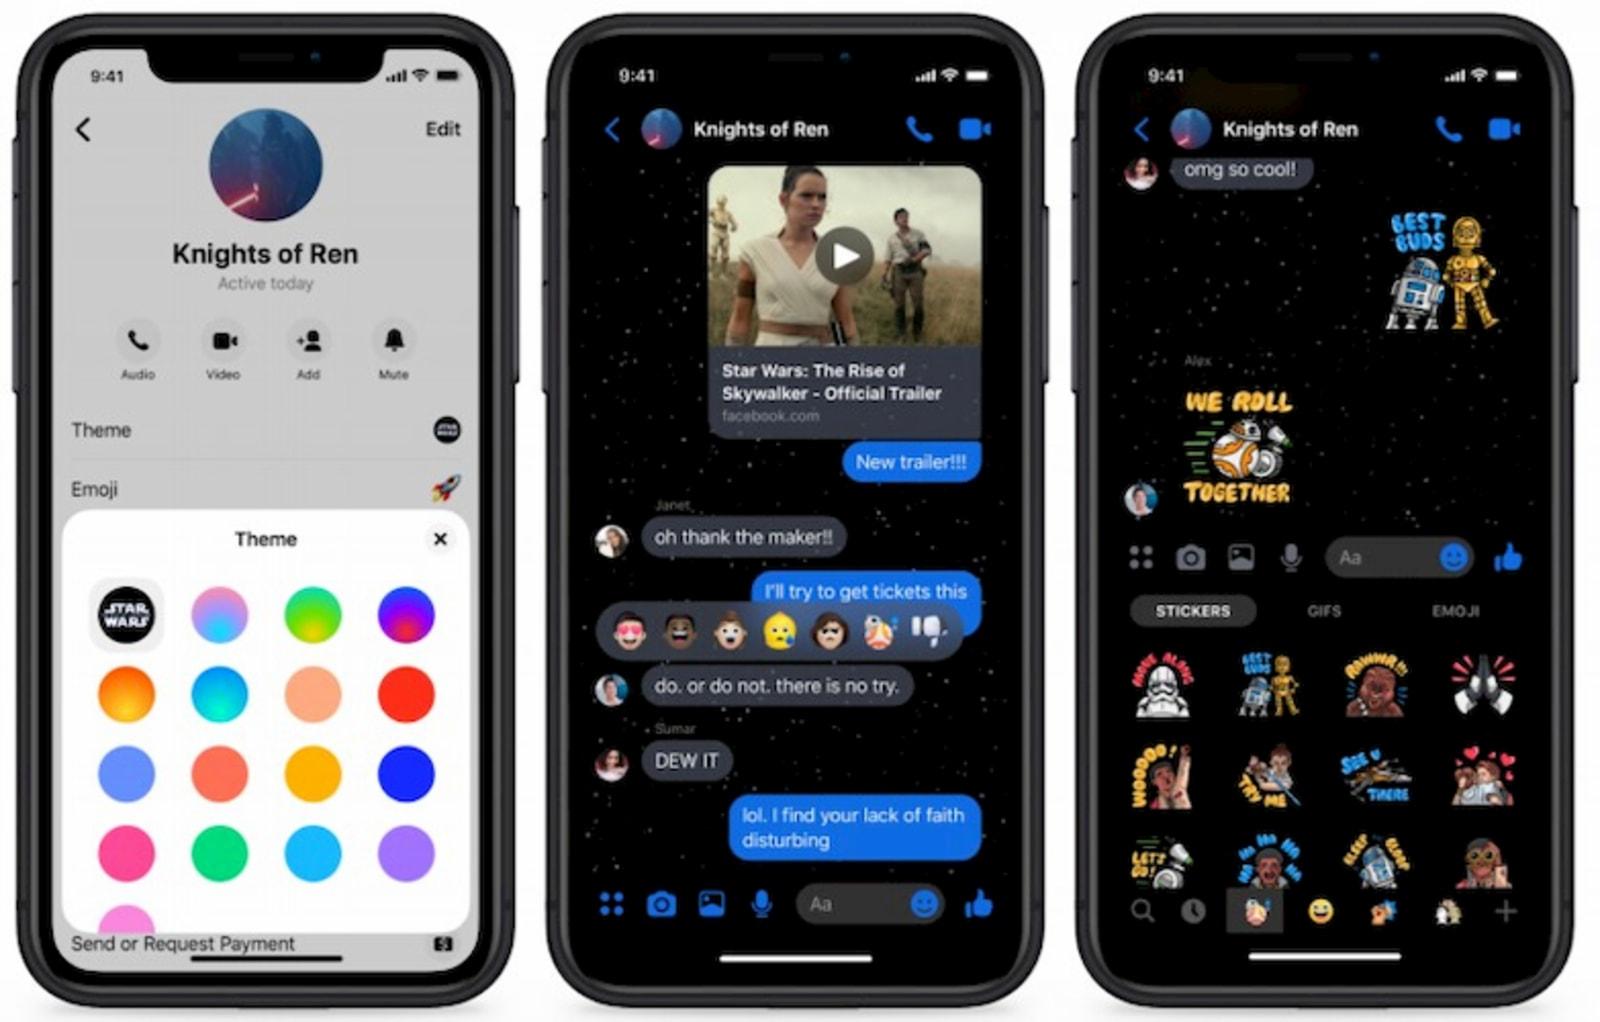 Star Wars theme in Facebook Messenger